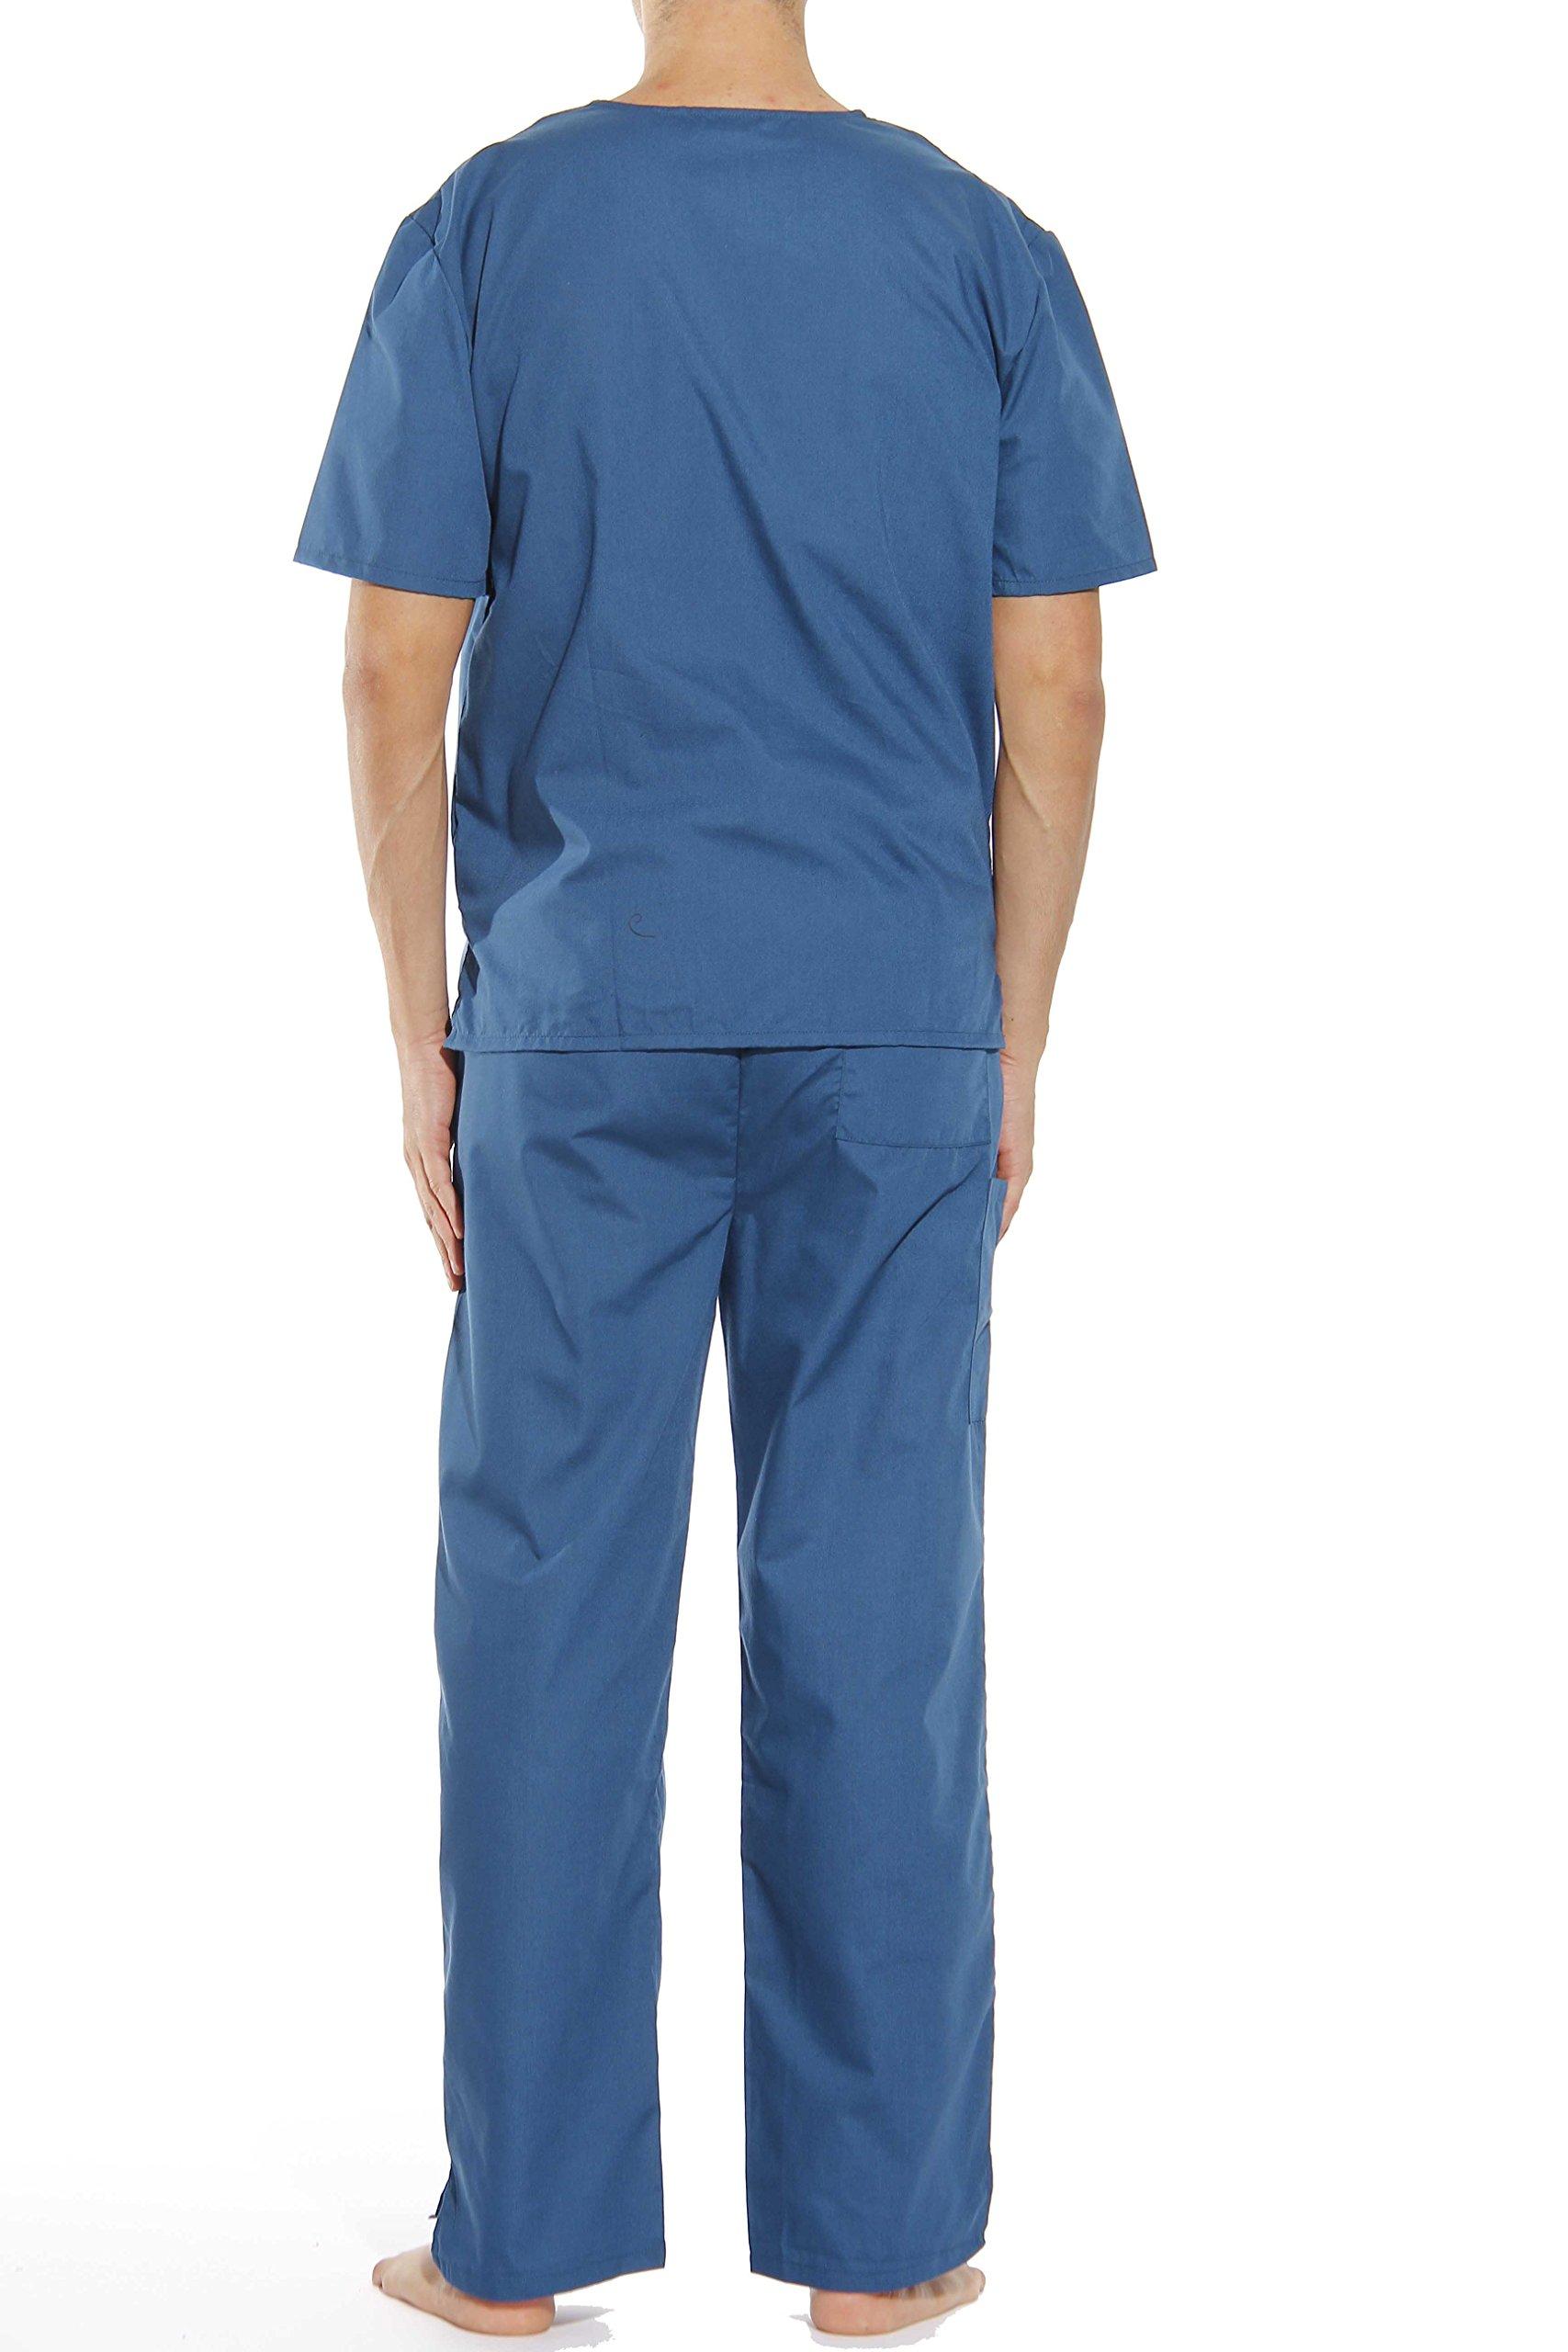 33000M-Carribean Blue-M Tropi Unisex Scrub Sets / Medical Scrubs / Nursing Scrubs by Tropi (Image #3)